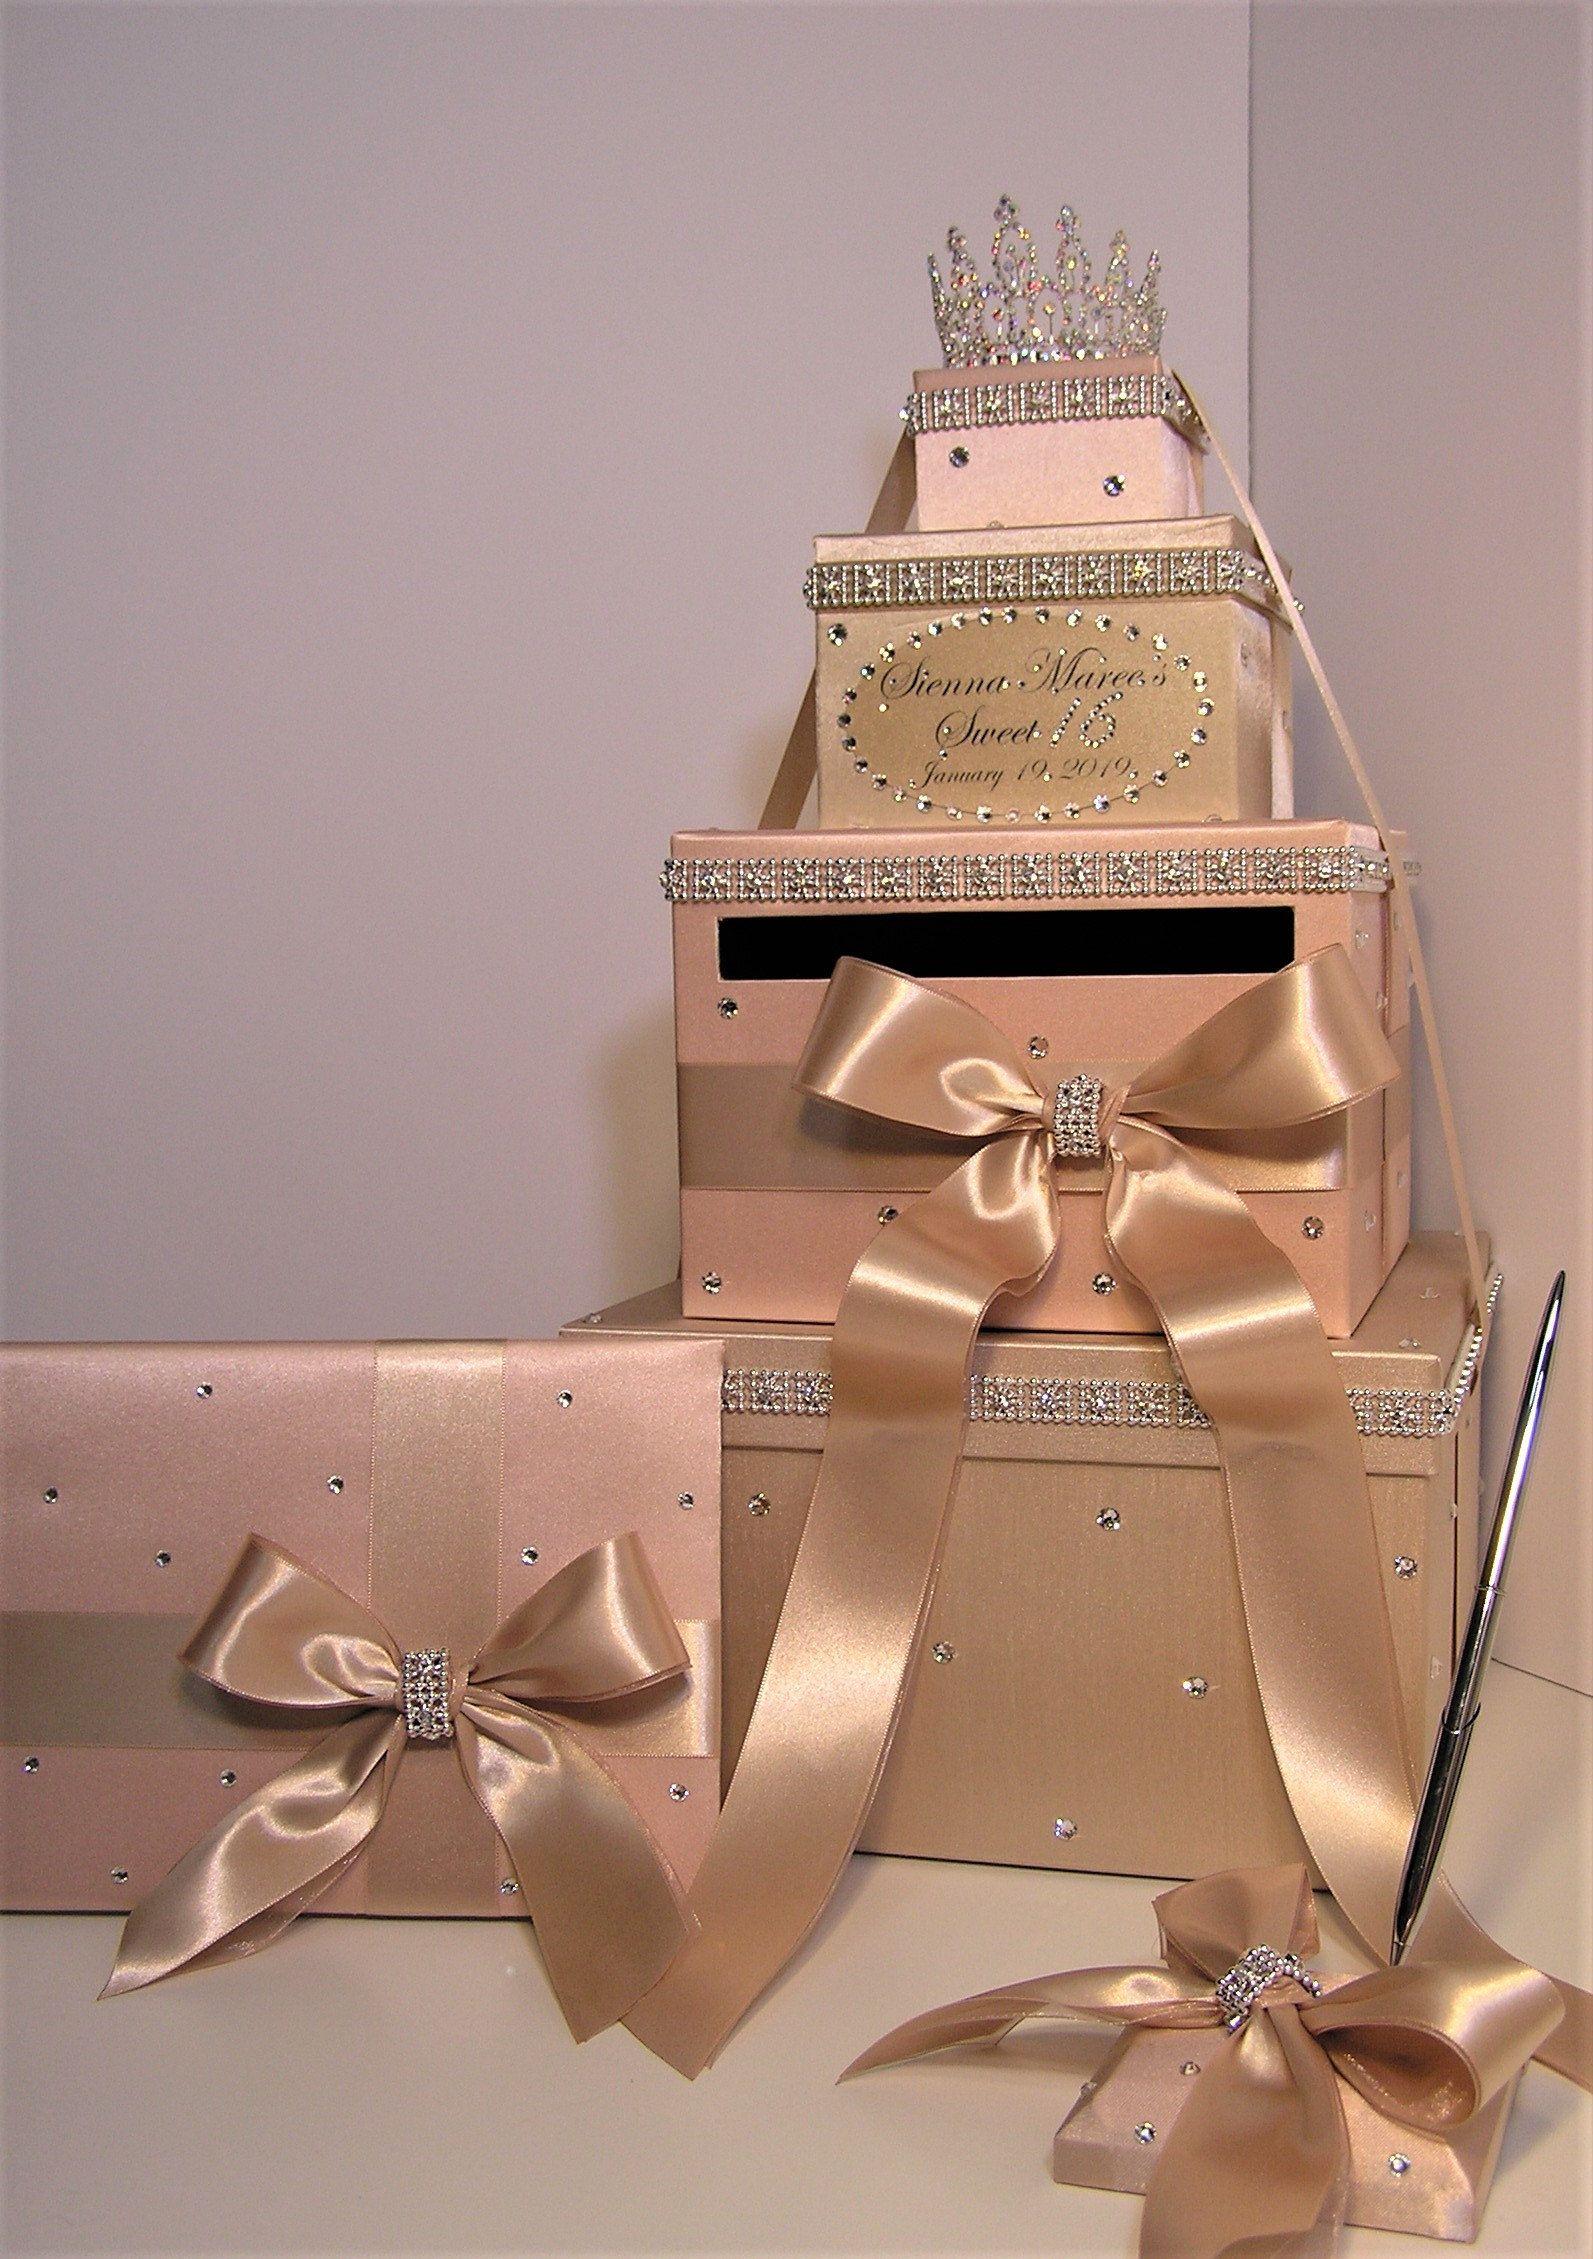 quinceañerasweet 16birthdaywedding card box 3 sets4